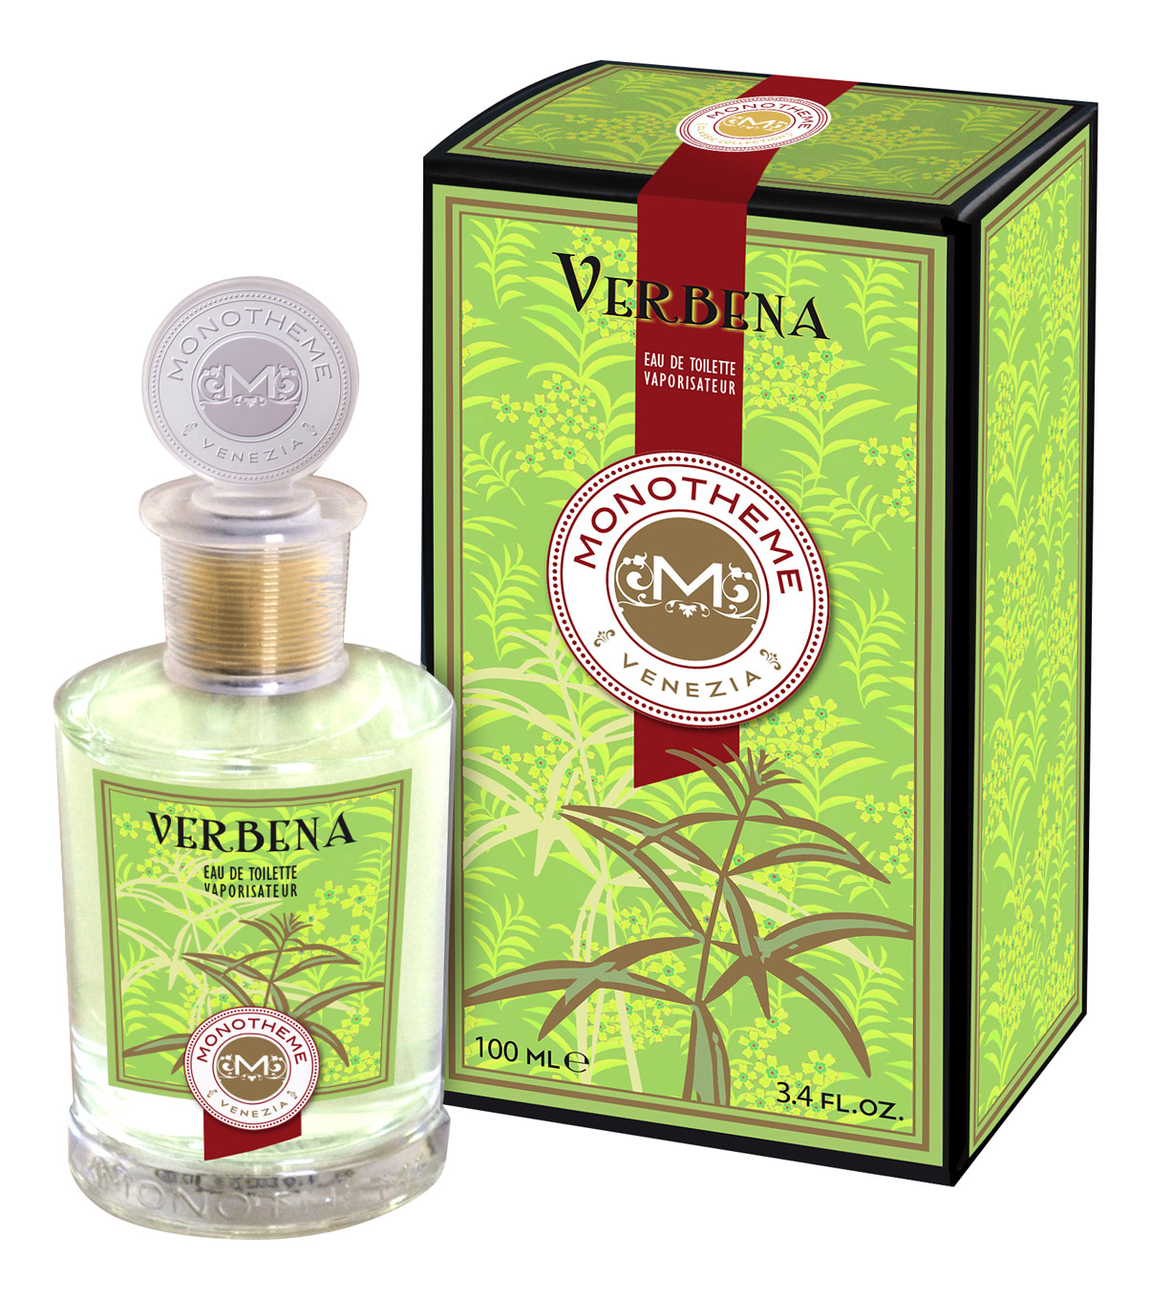 Купить Verbena: туалетная вода 100мл, Monotheme Fine Fragrances Venezia